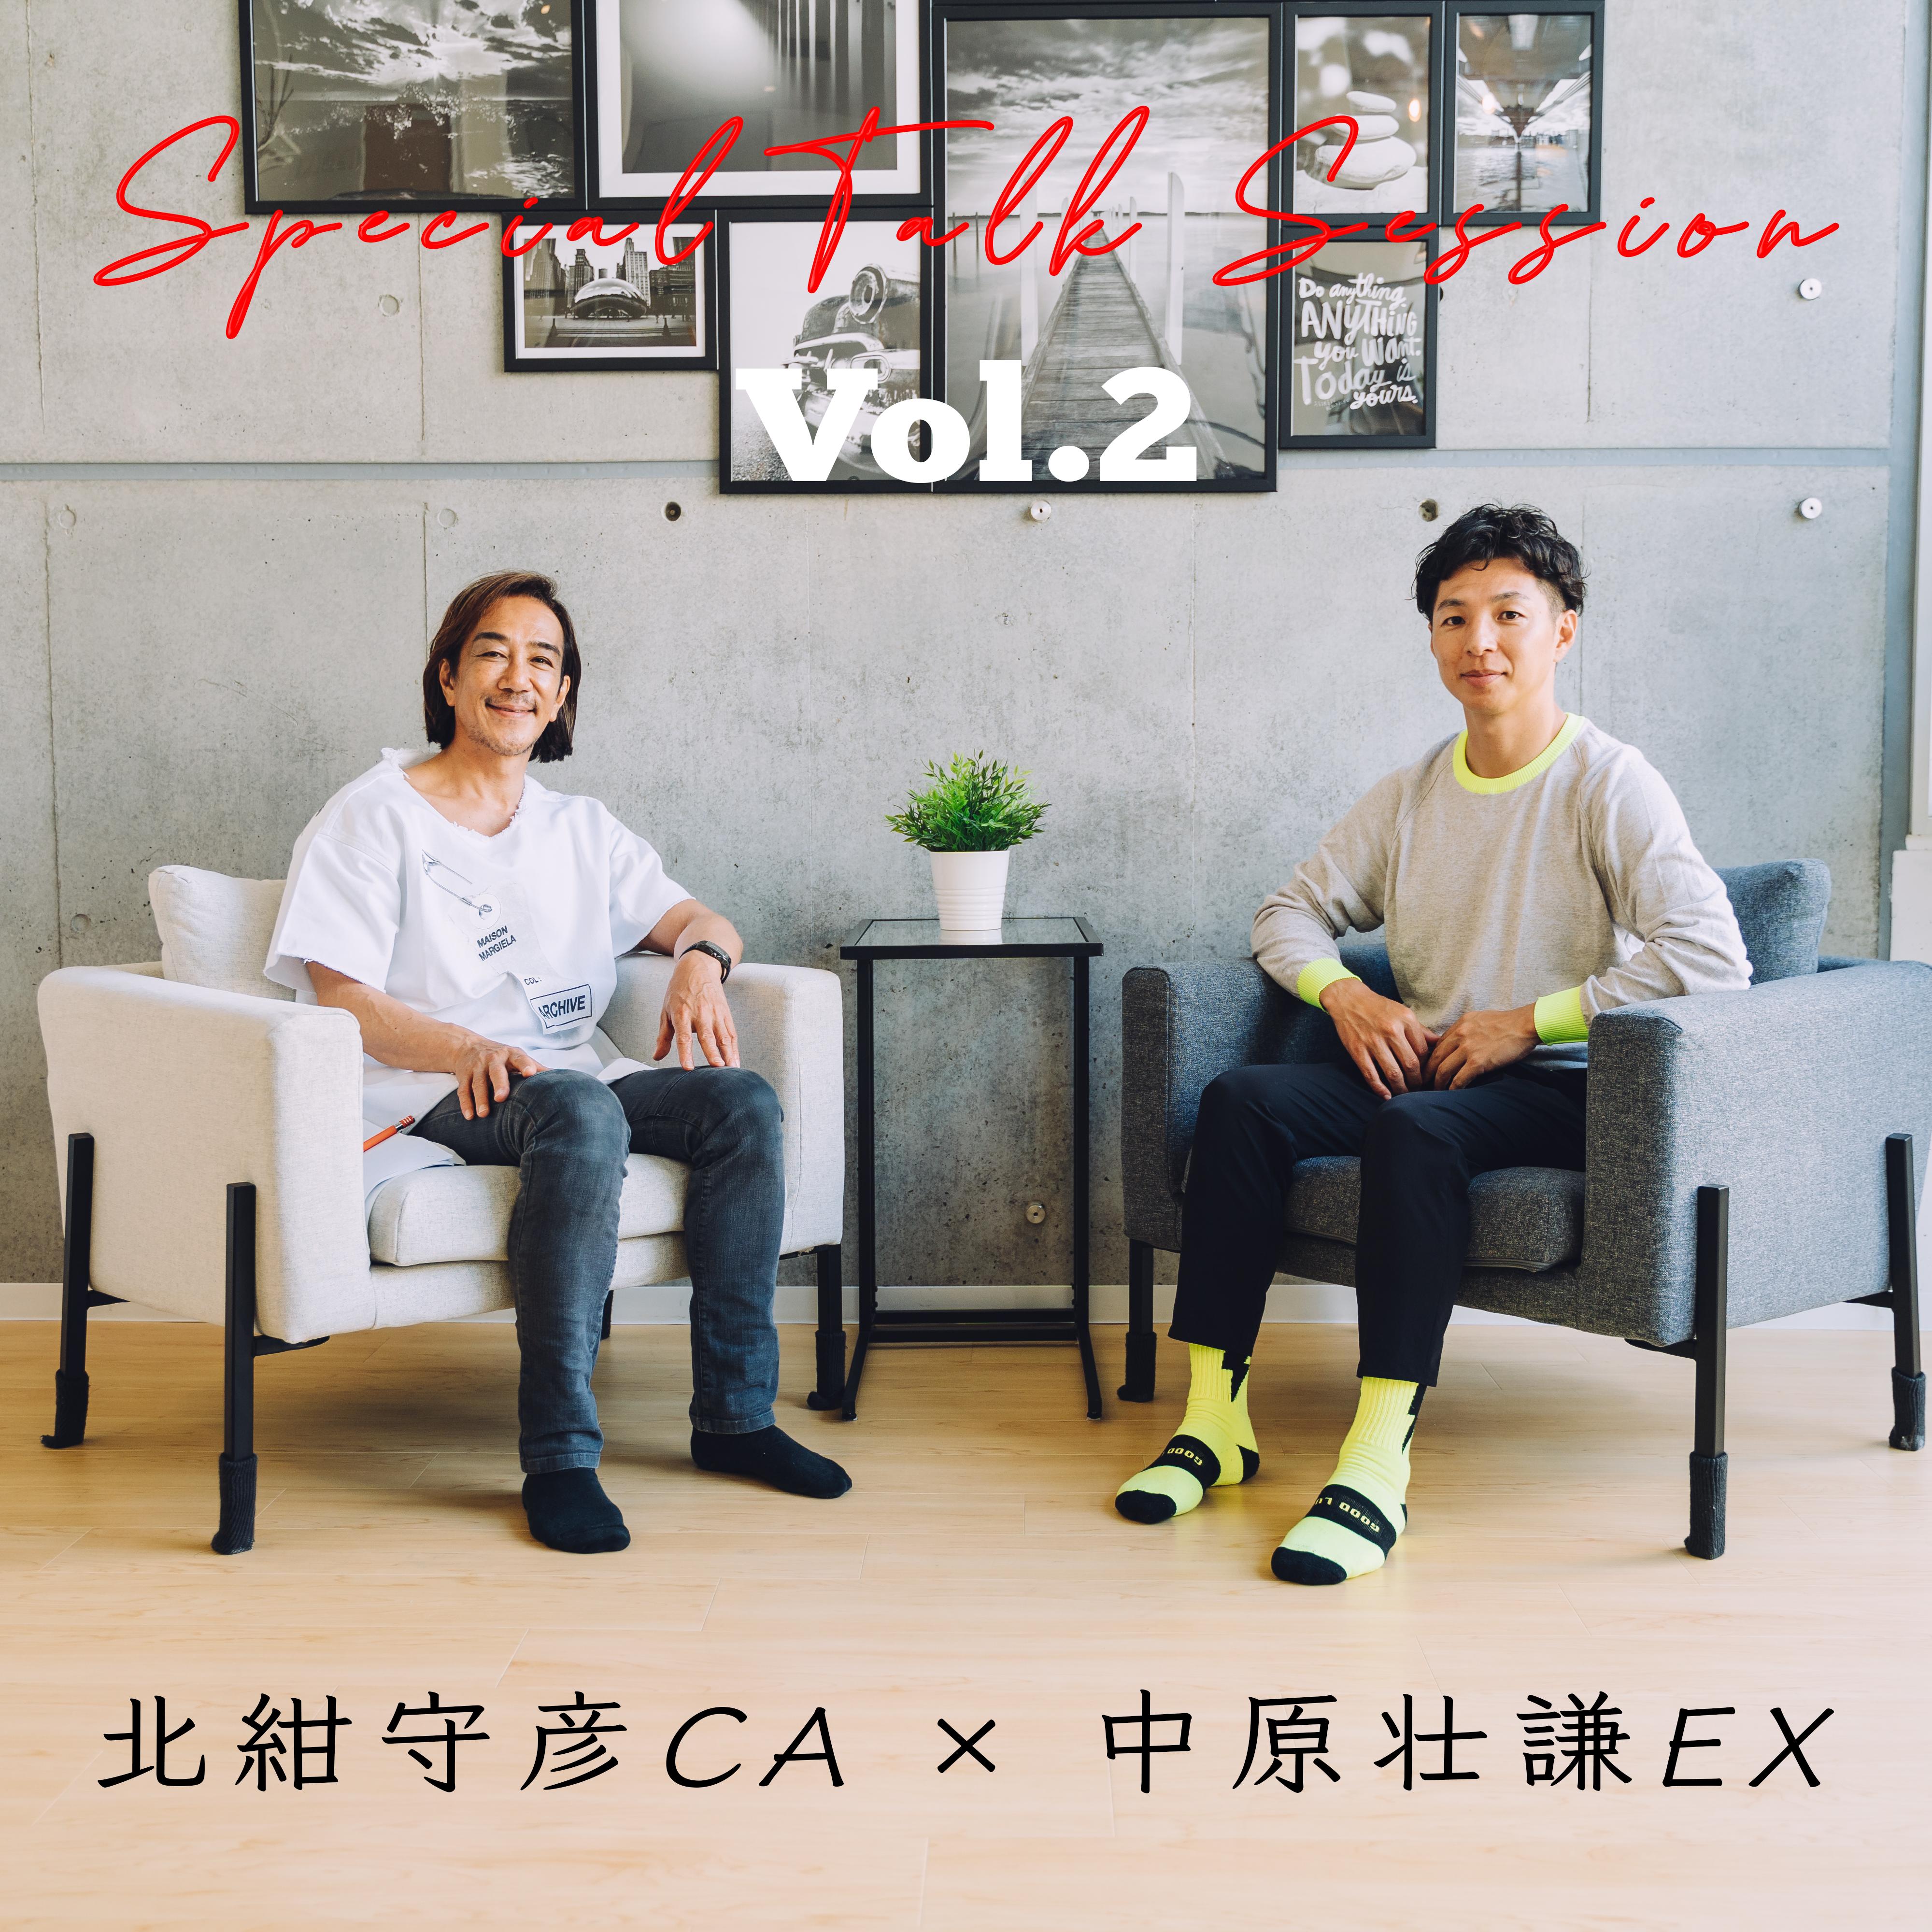 配信: Special Talk Session 【中原壮謙EX✖️北紺守彦CA】  vol.2